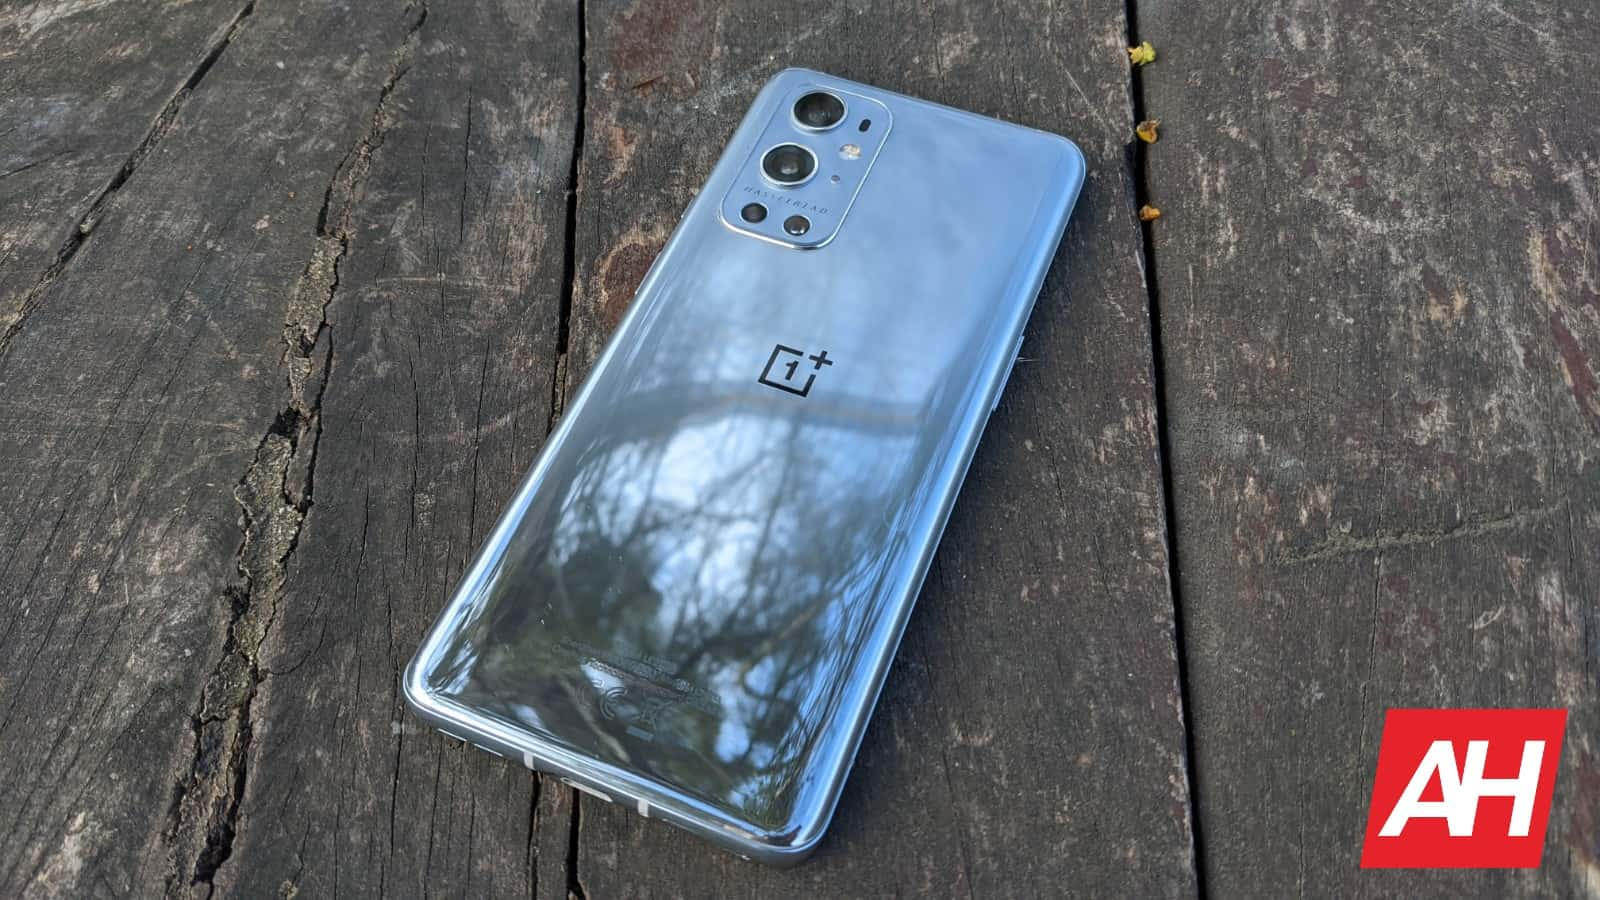 AH OnePlus 9 Pro KL image 3